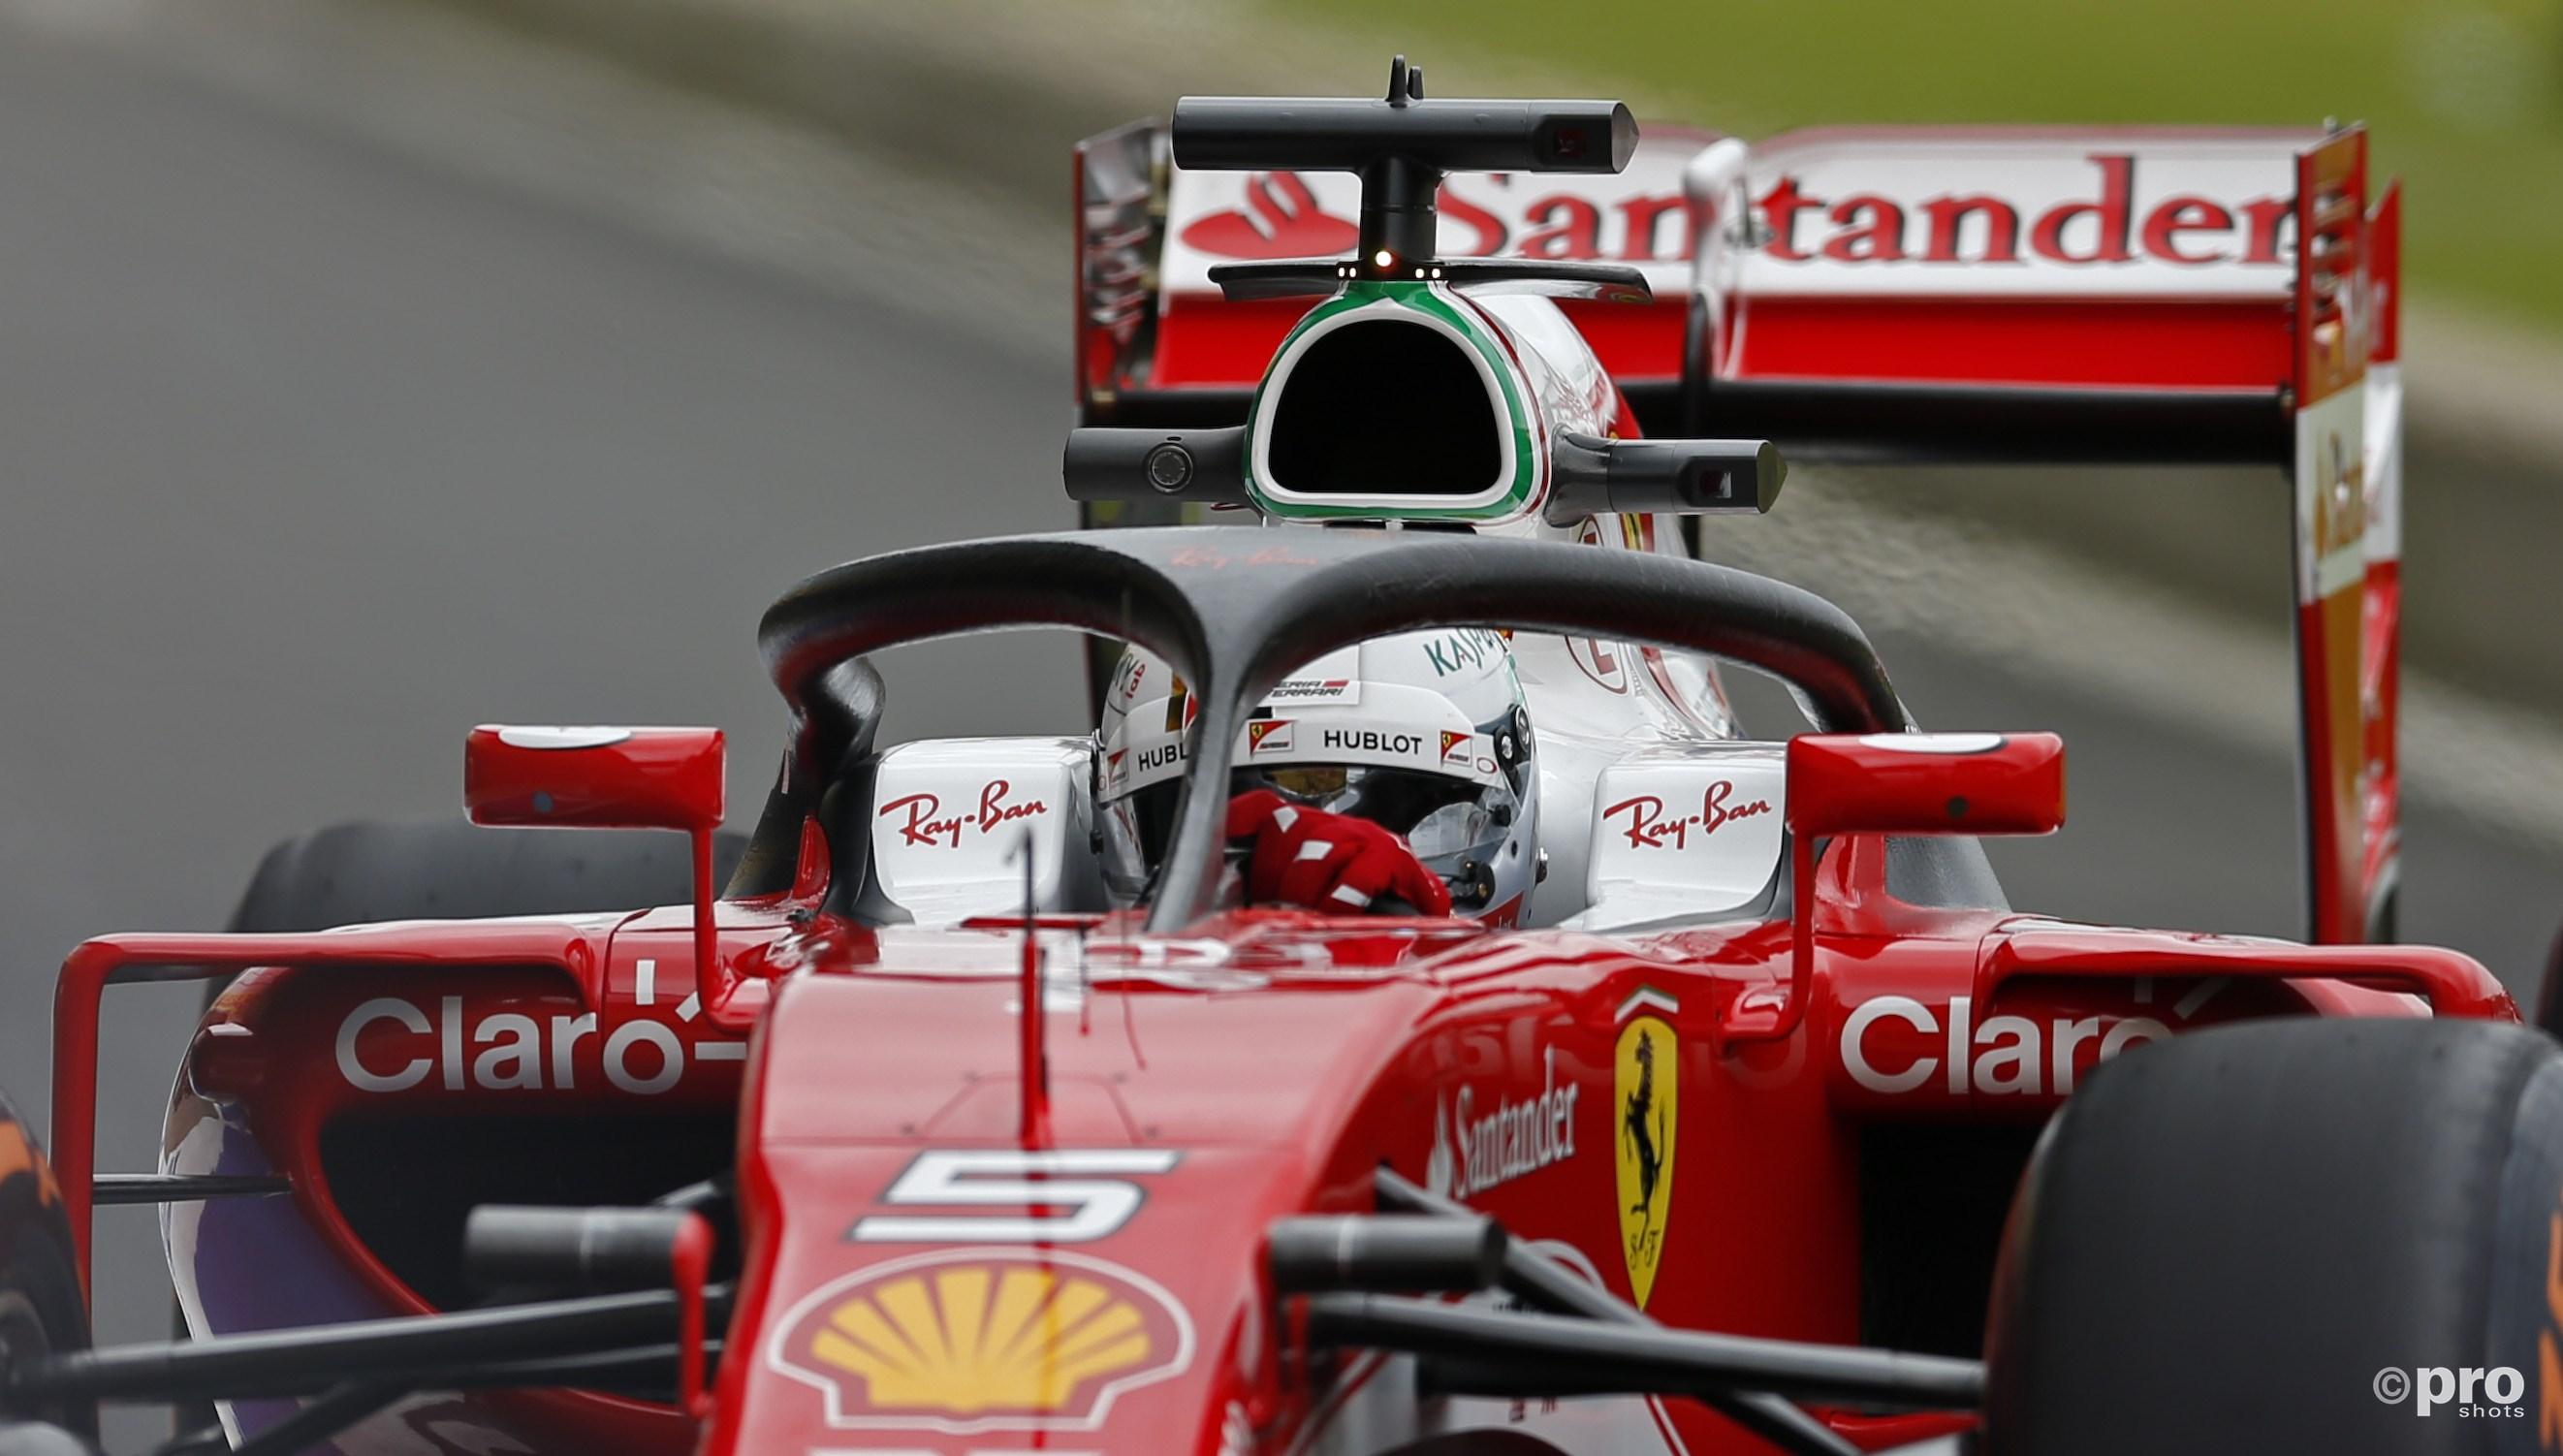 Formule 1 wil omstreden halo in 2018 invoeren (Pro Shots/Action Images)